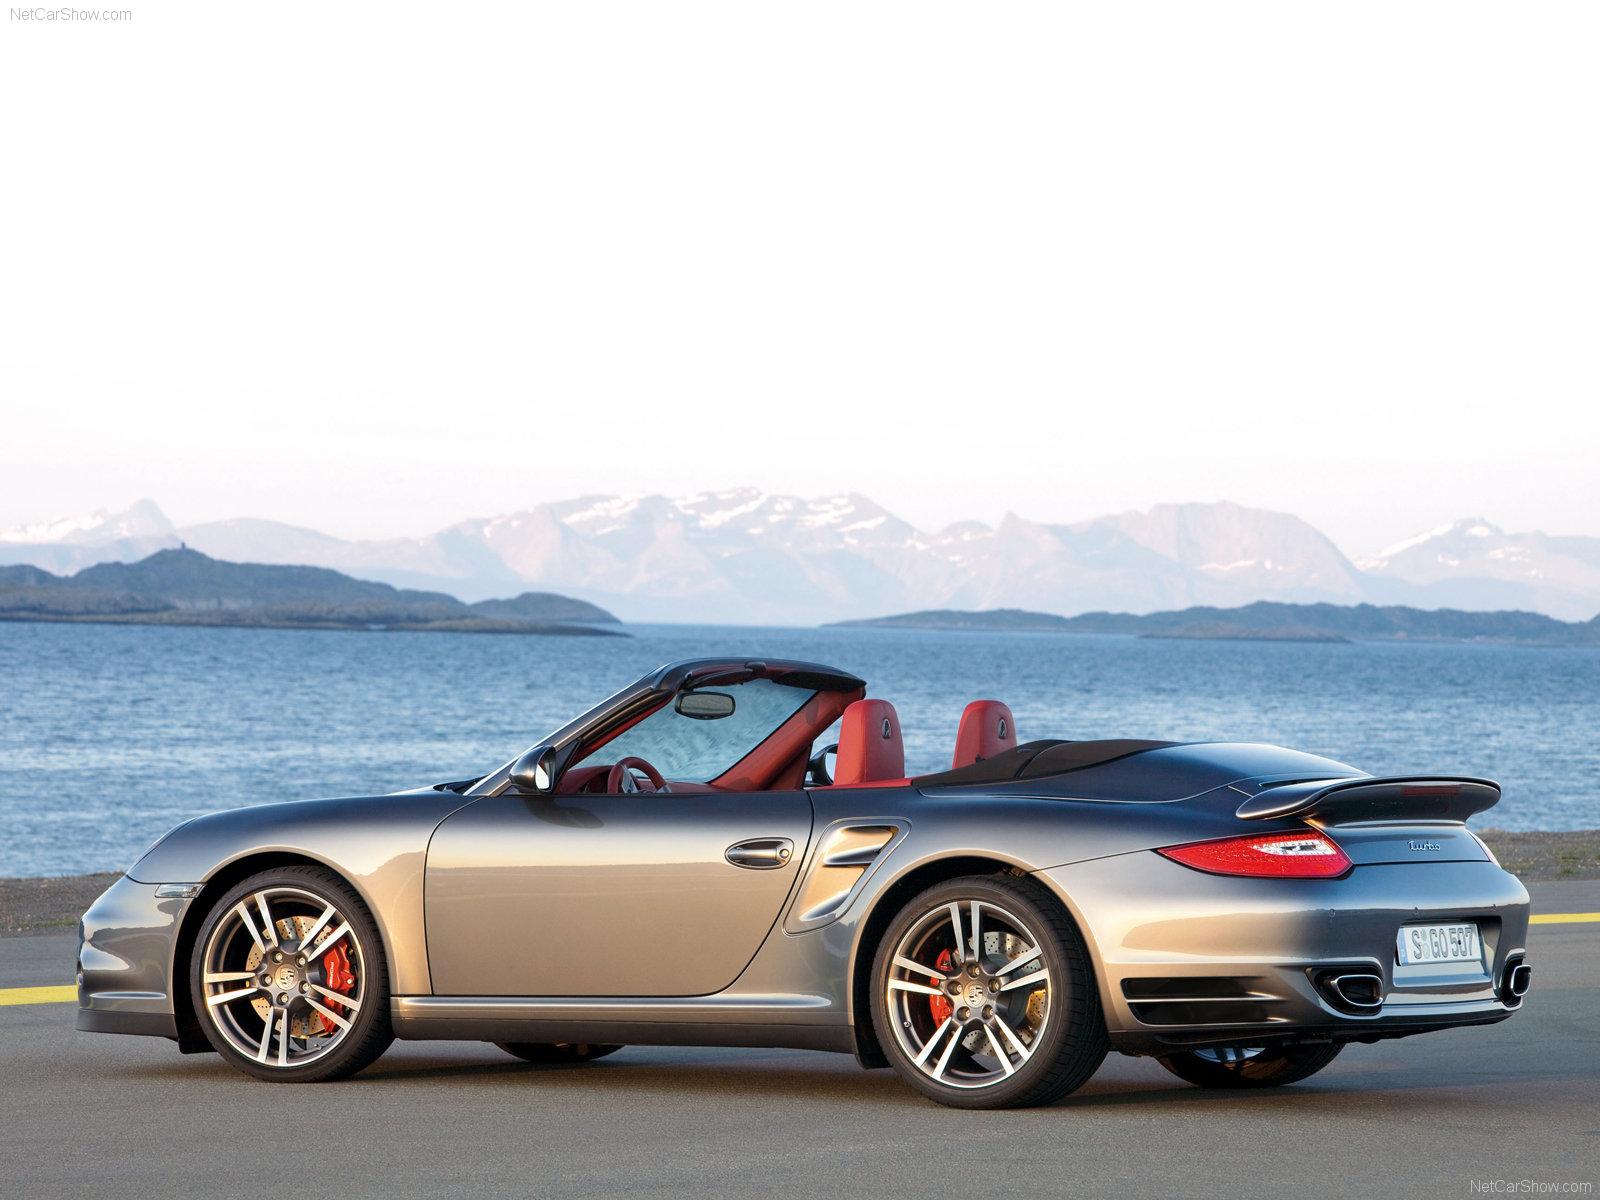 2010 grey porsche 911 turbo cabriolet wallpapers. Black Bedroom Furniture Sets. Home Design Ideas